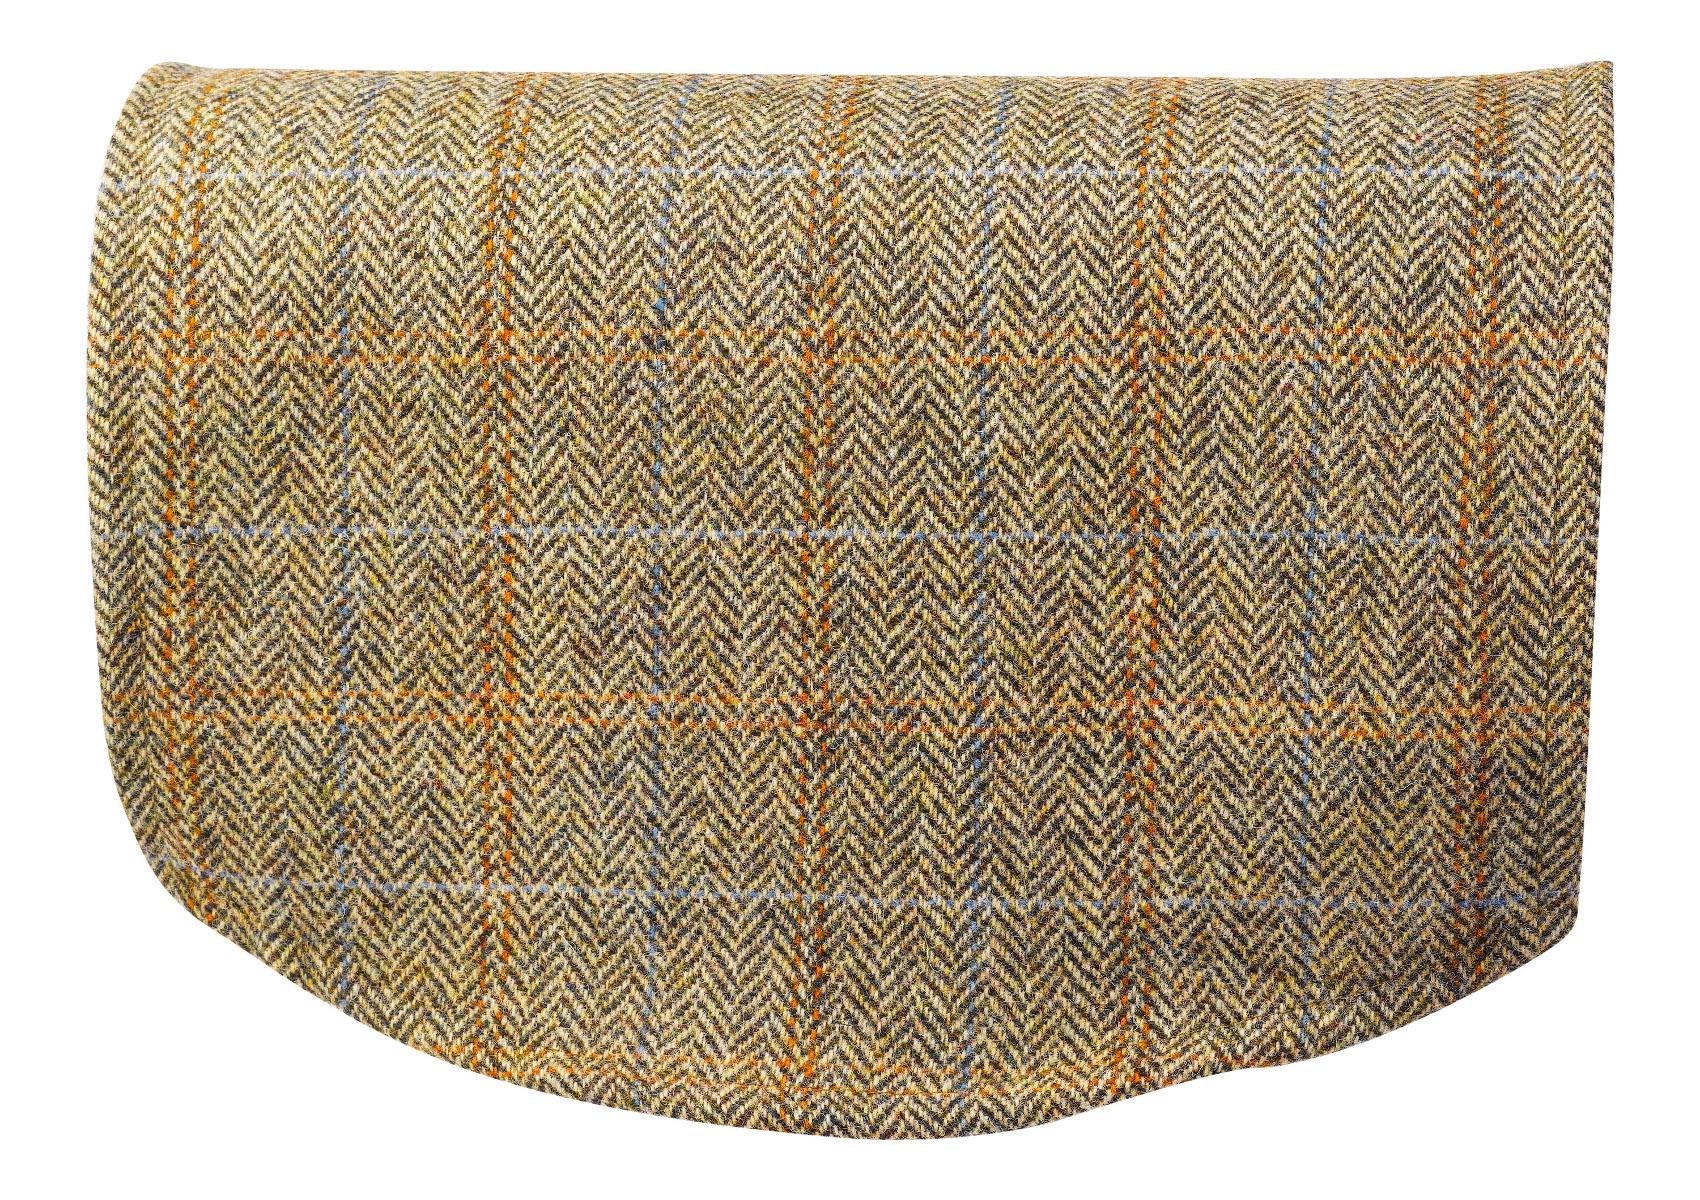 chair covers scotland tempur pedic scottish tweed single back 100 pure new wool sofa